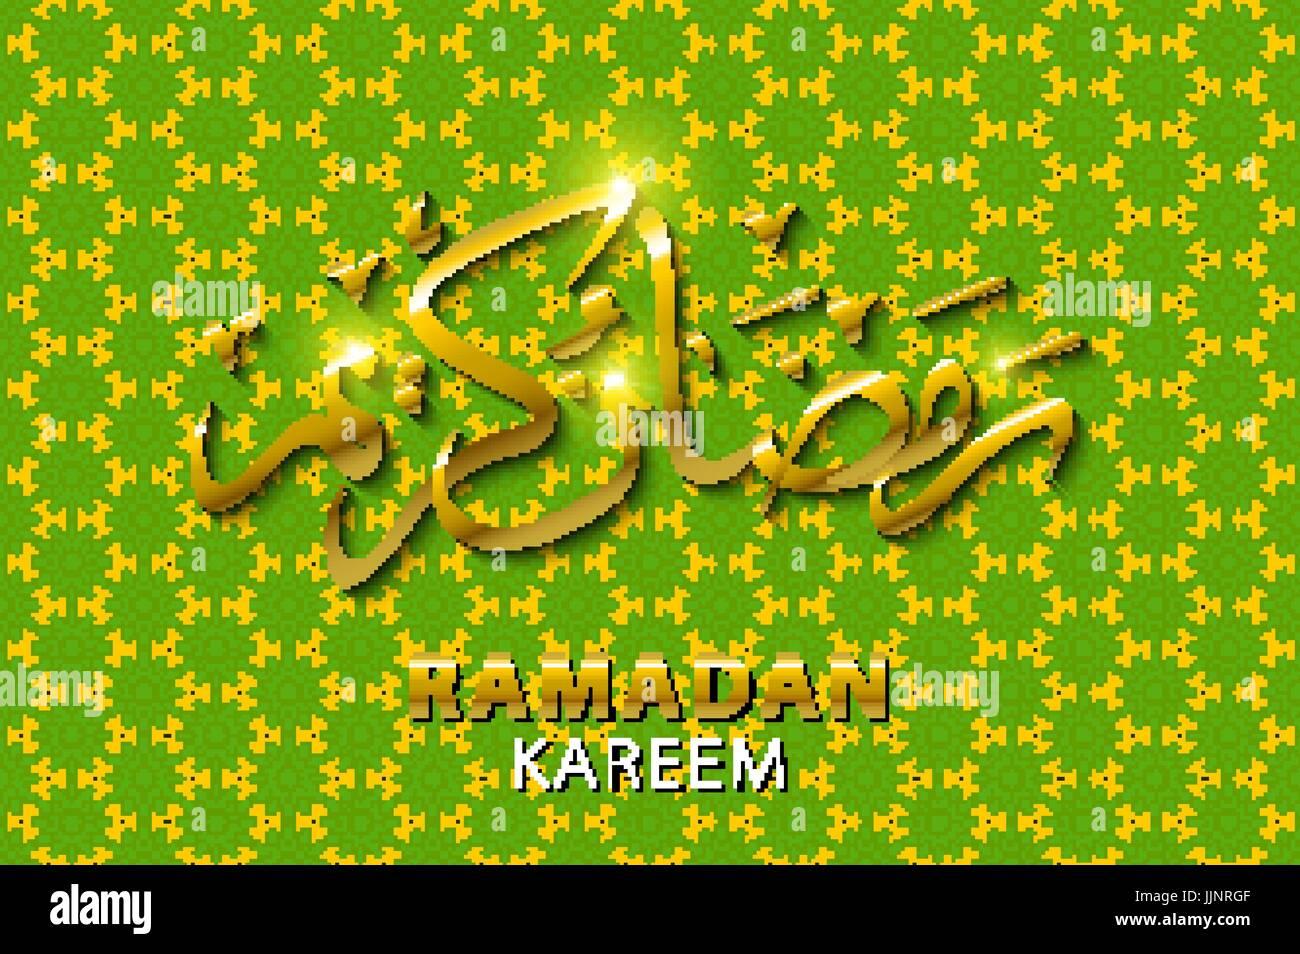 Ramadan greetings in arabic script an islamic greeting card for ramadan greetings in arabic script an islamic greeting card for holy month of ramadan kareem vector illustration art m4hsunfo